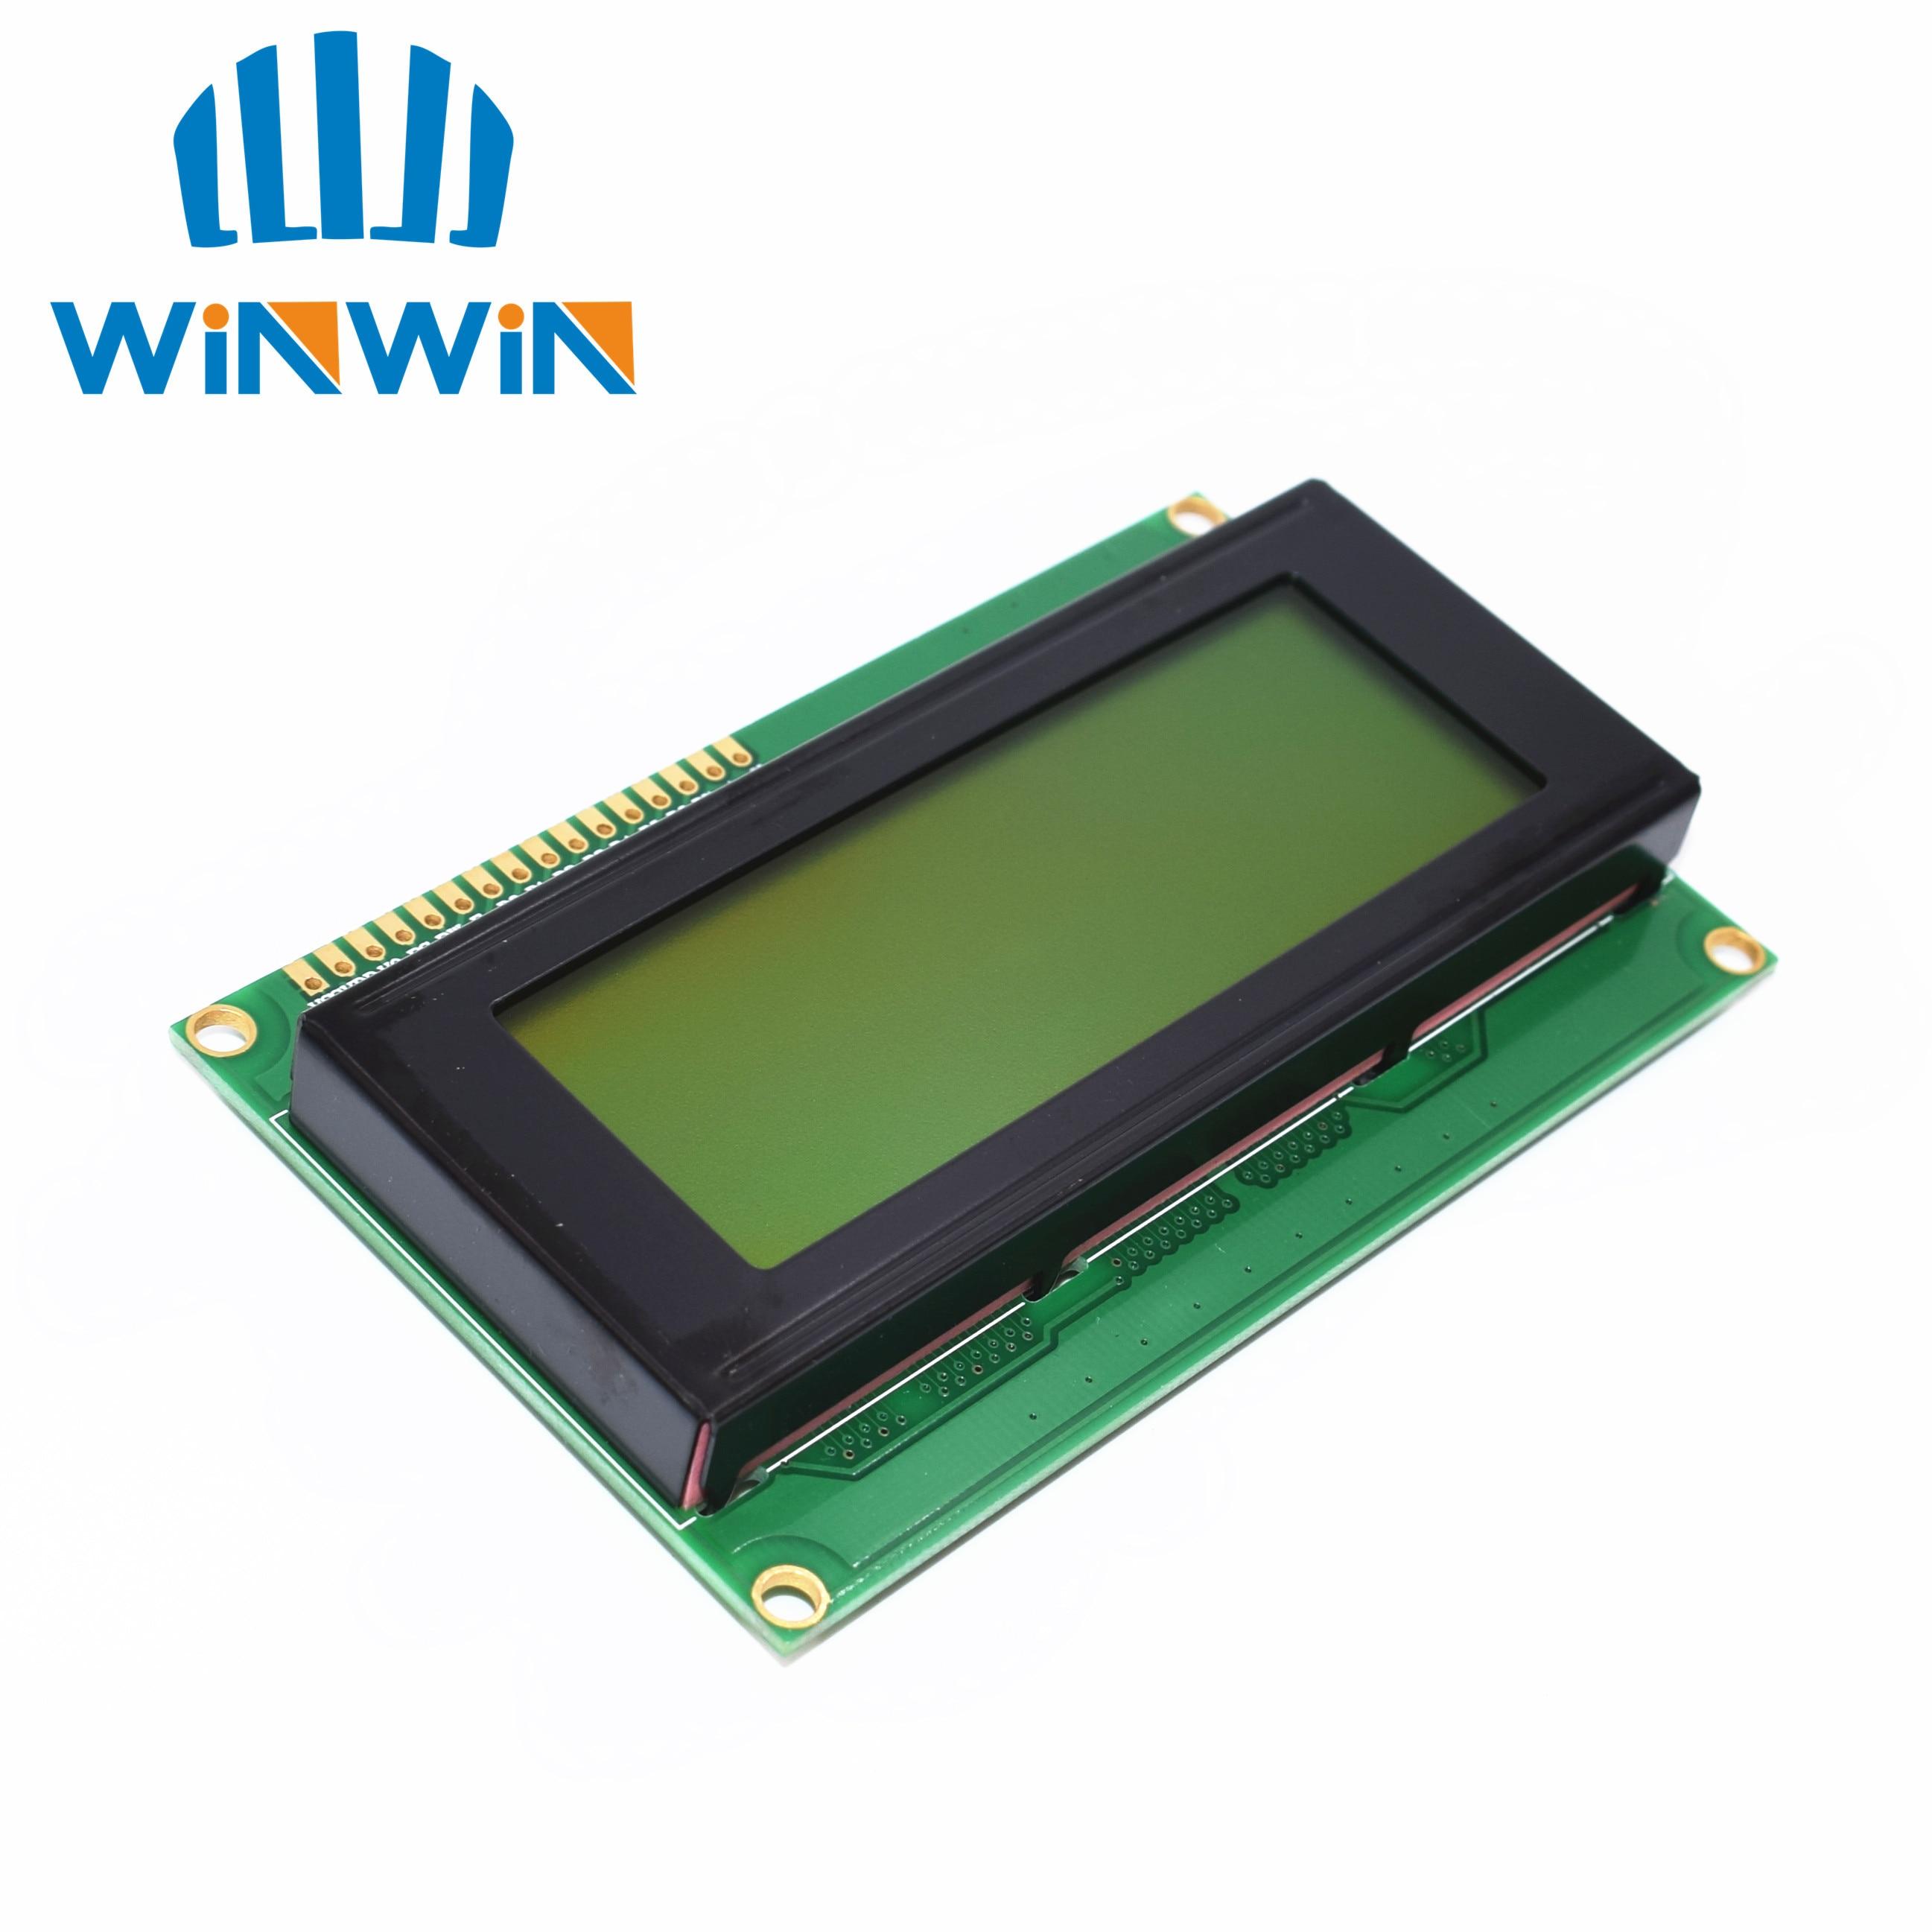 10pcs LCD Board 2004 20*4 LCD 20X4 5V Yellow-green Screen LCD2004 Display LCD Module LCD 2004